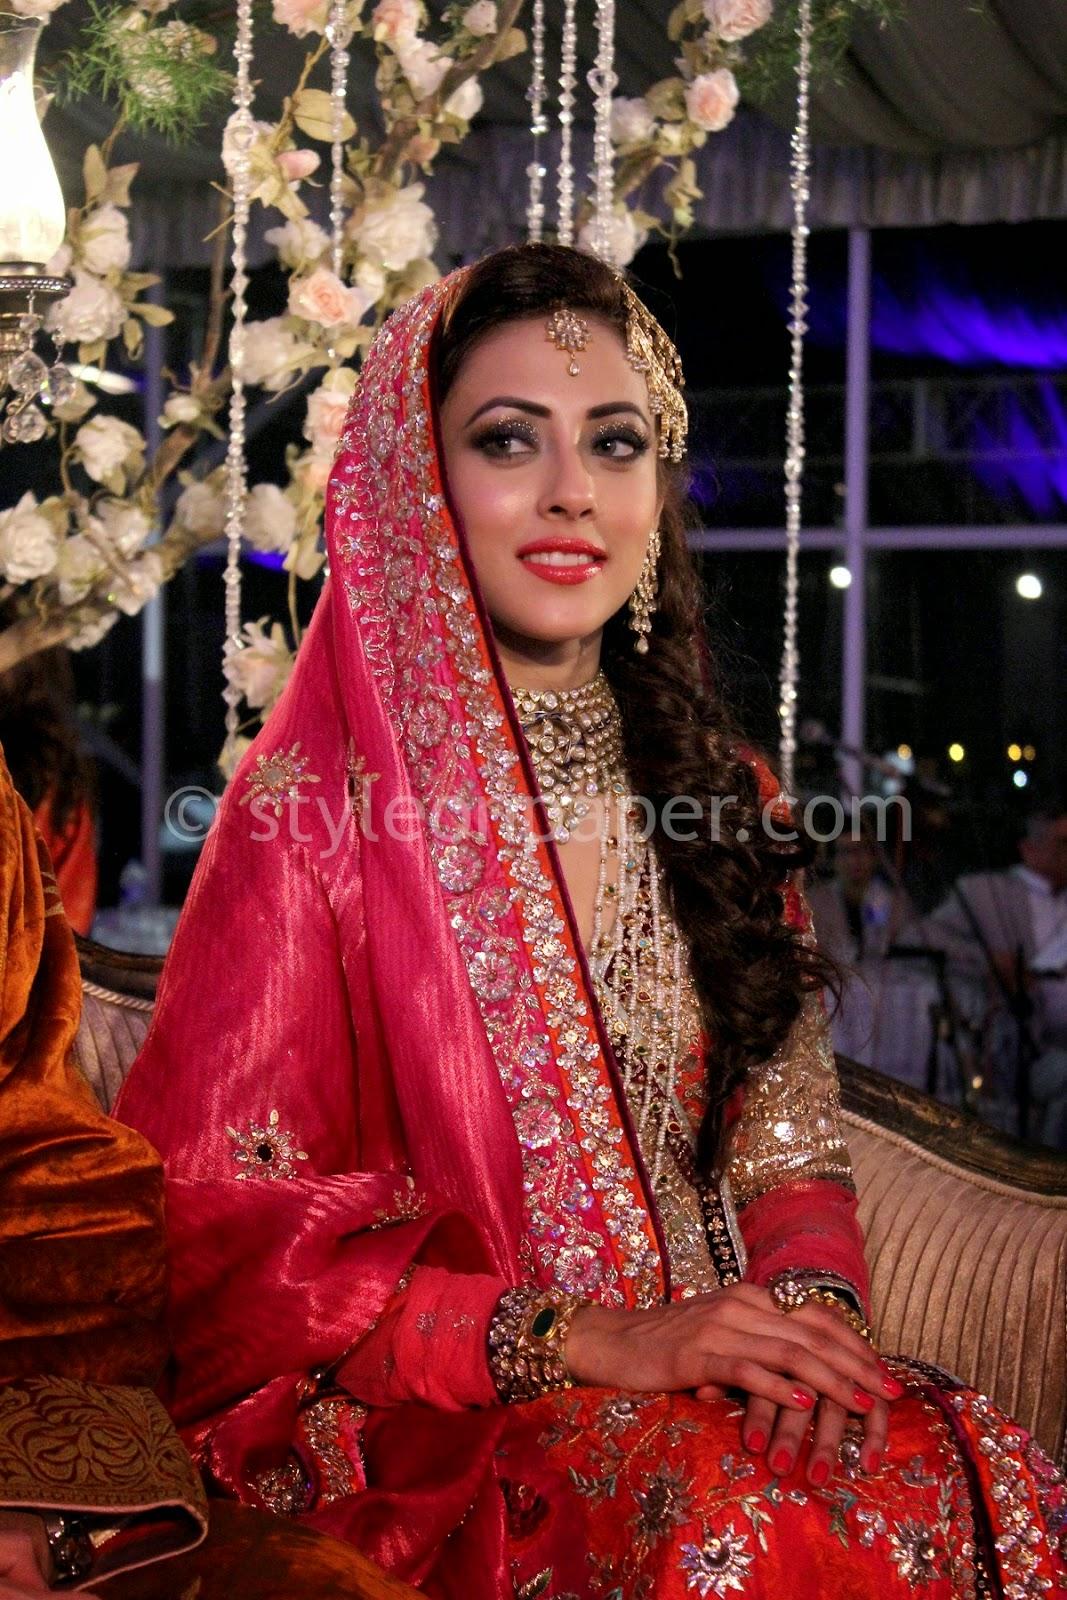 Pakistani model wedding